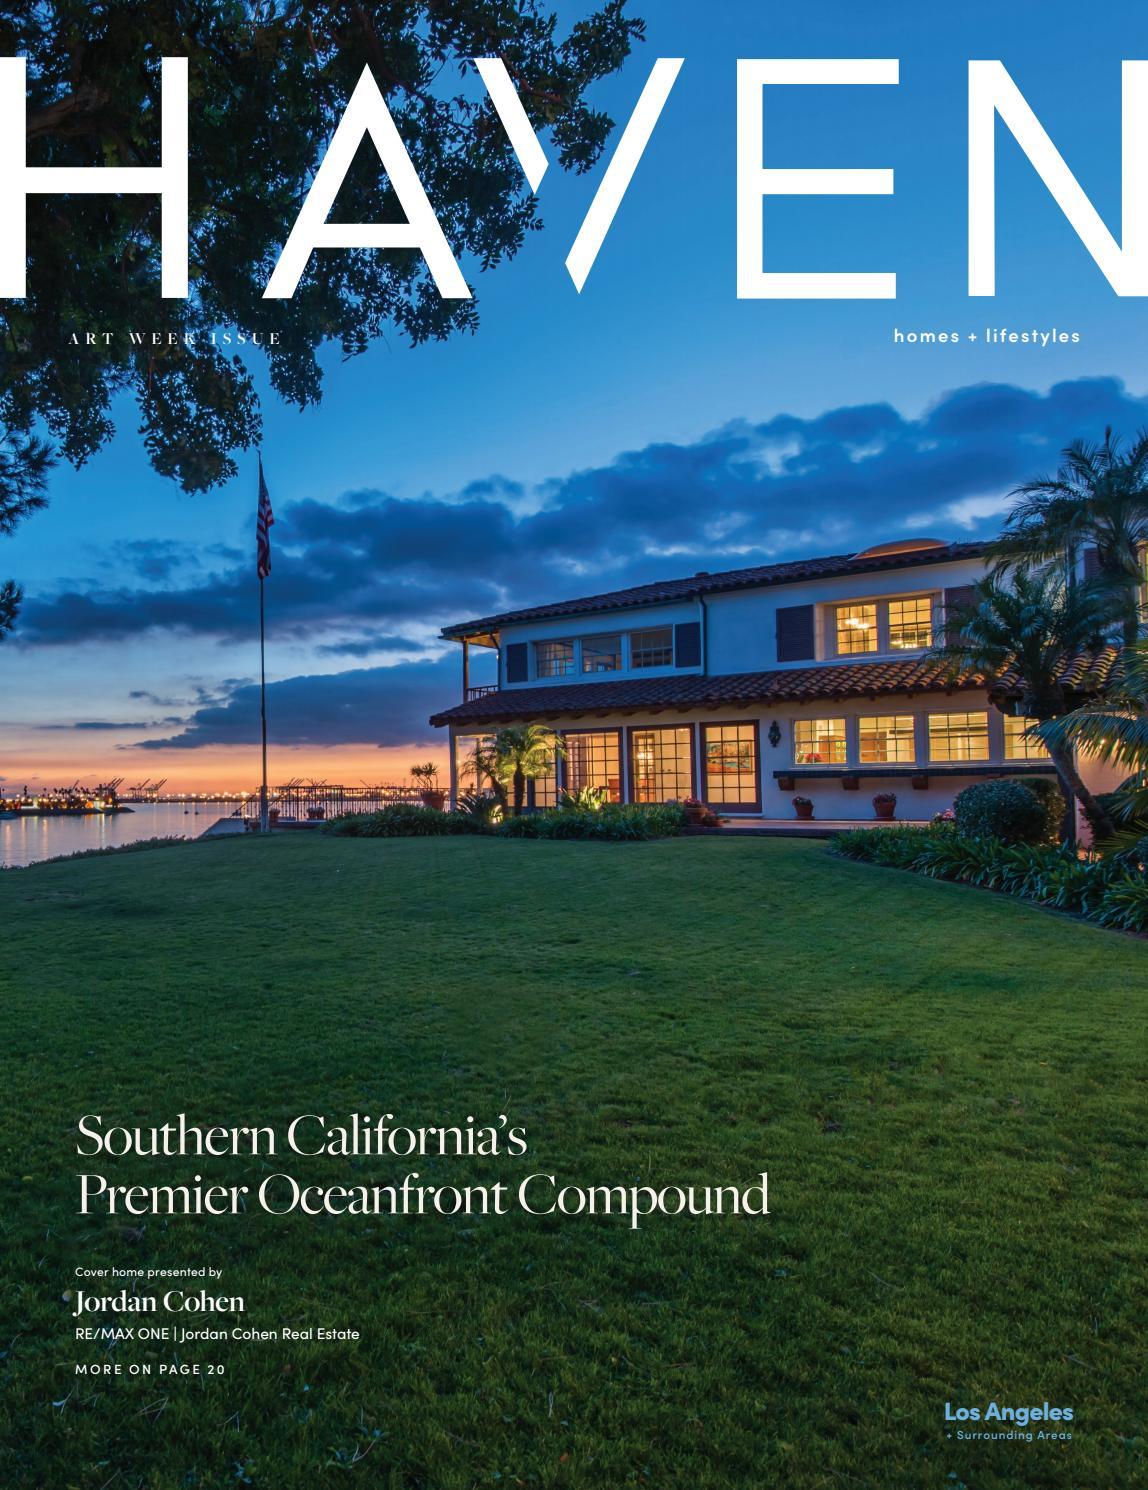 Haven Los Angeles La Art Week Issue